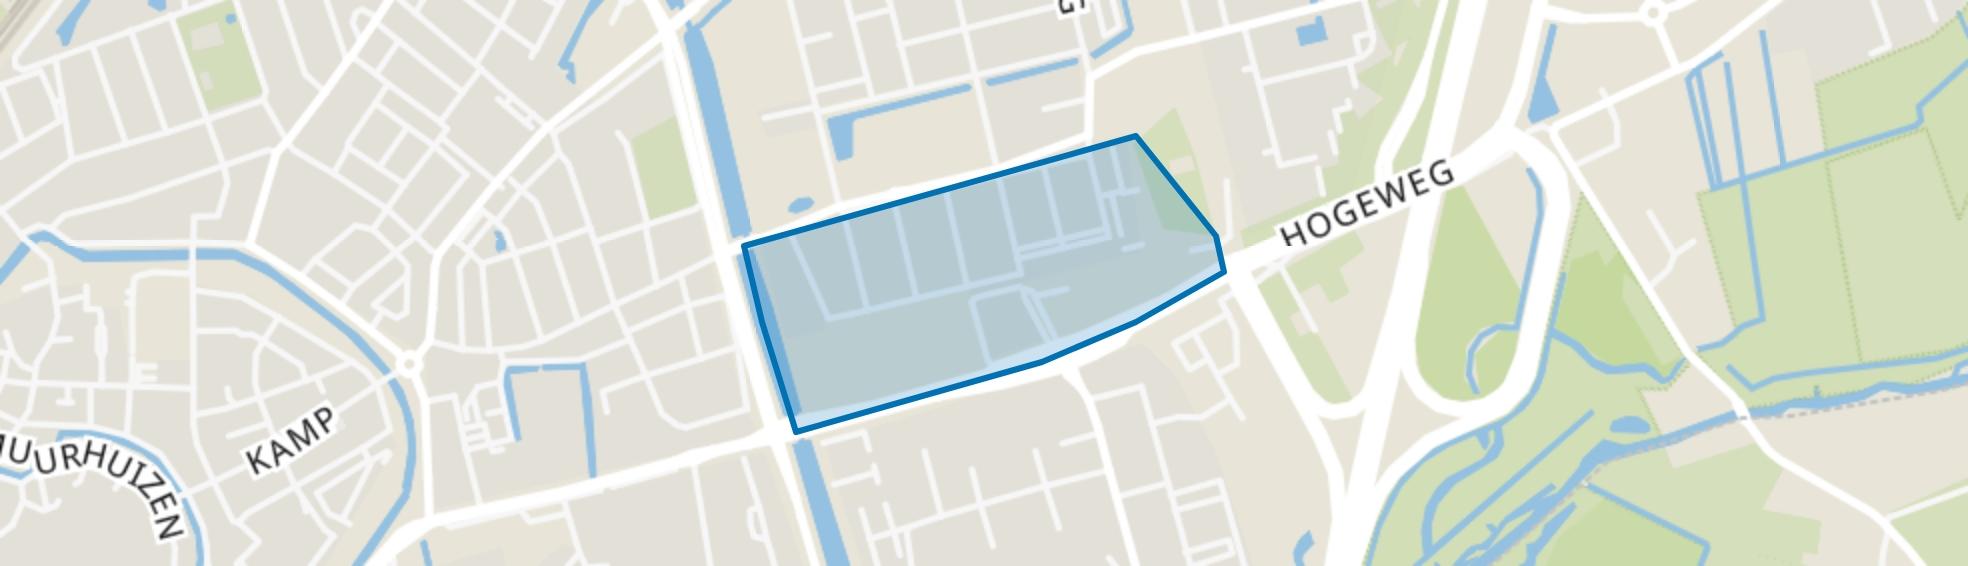 Zwaluwenstraat, Amersfoort map